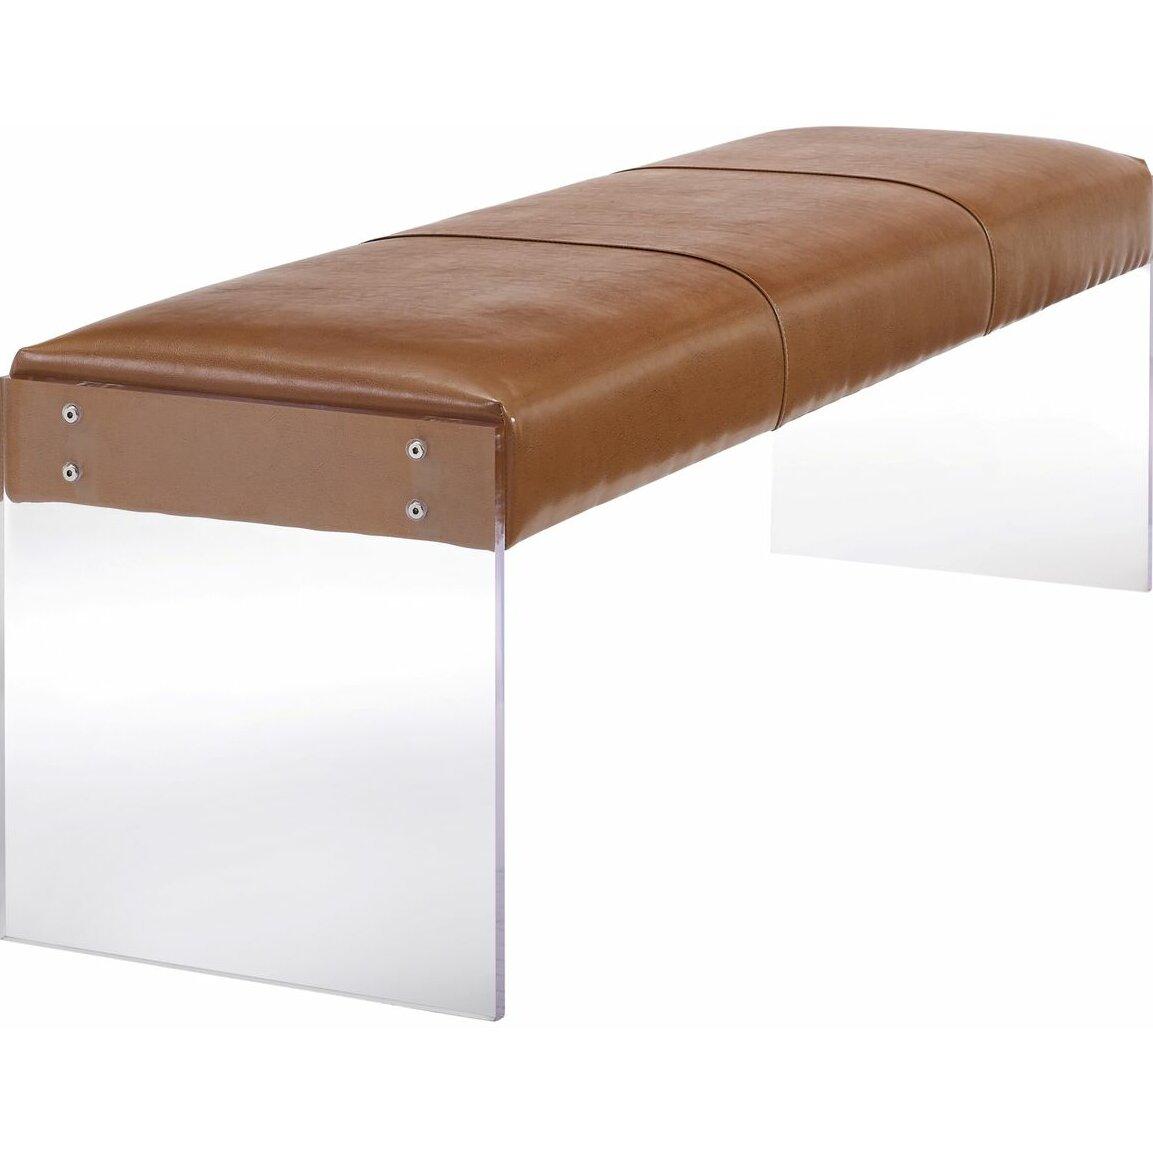 tov envy leather bedroom bench amp reviews wayfair bedroom breathtaking leather bedroom bench give